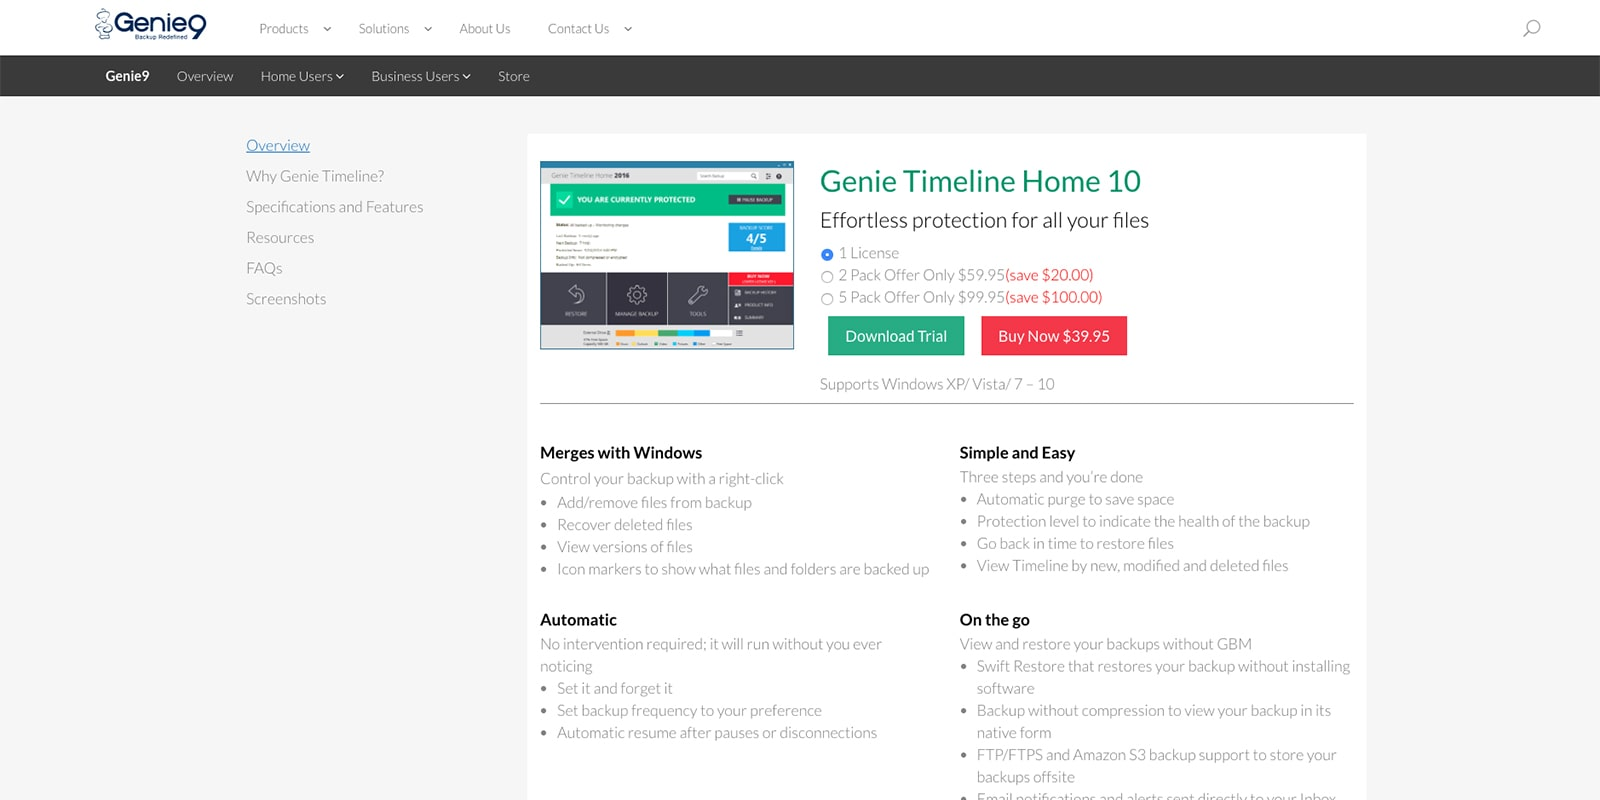 Genie Timeline Home